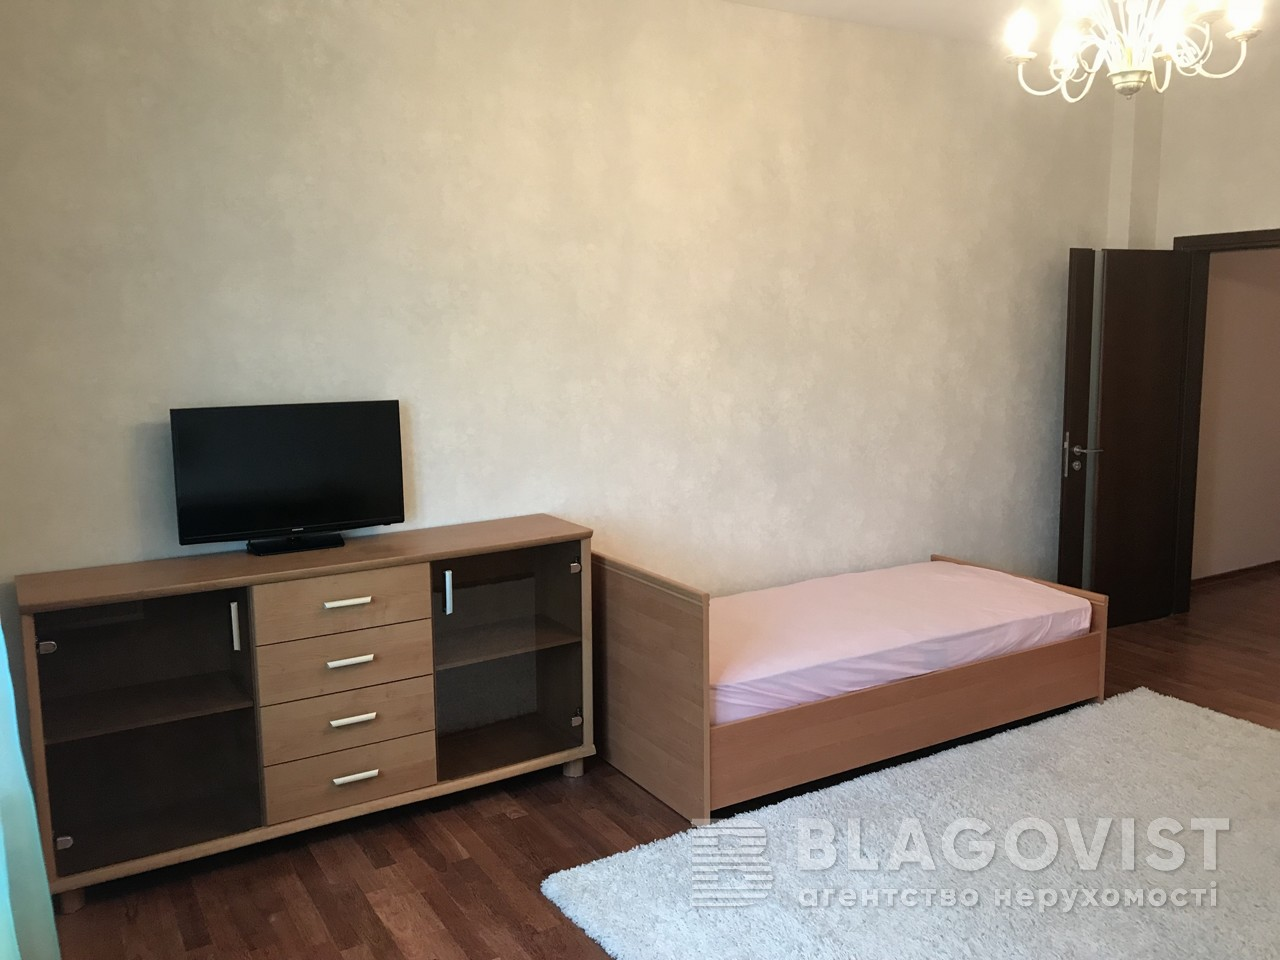 Квартира A-73479, Коновальца Евгения (Щорса), 32а, Киев - Фото 27